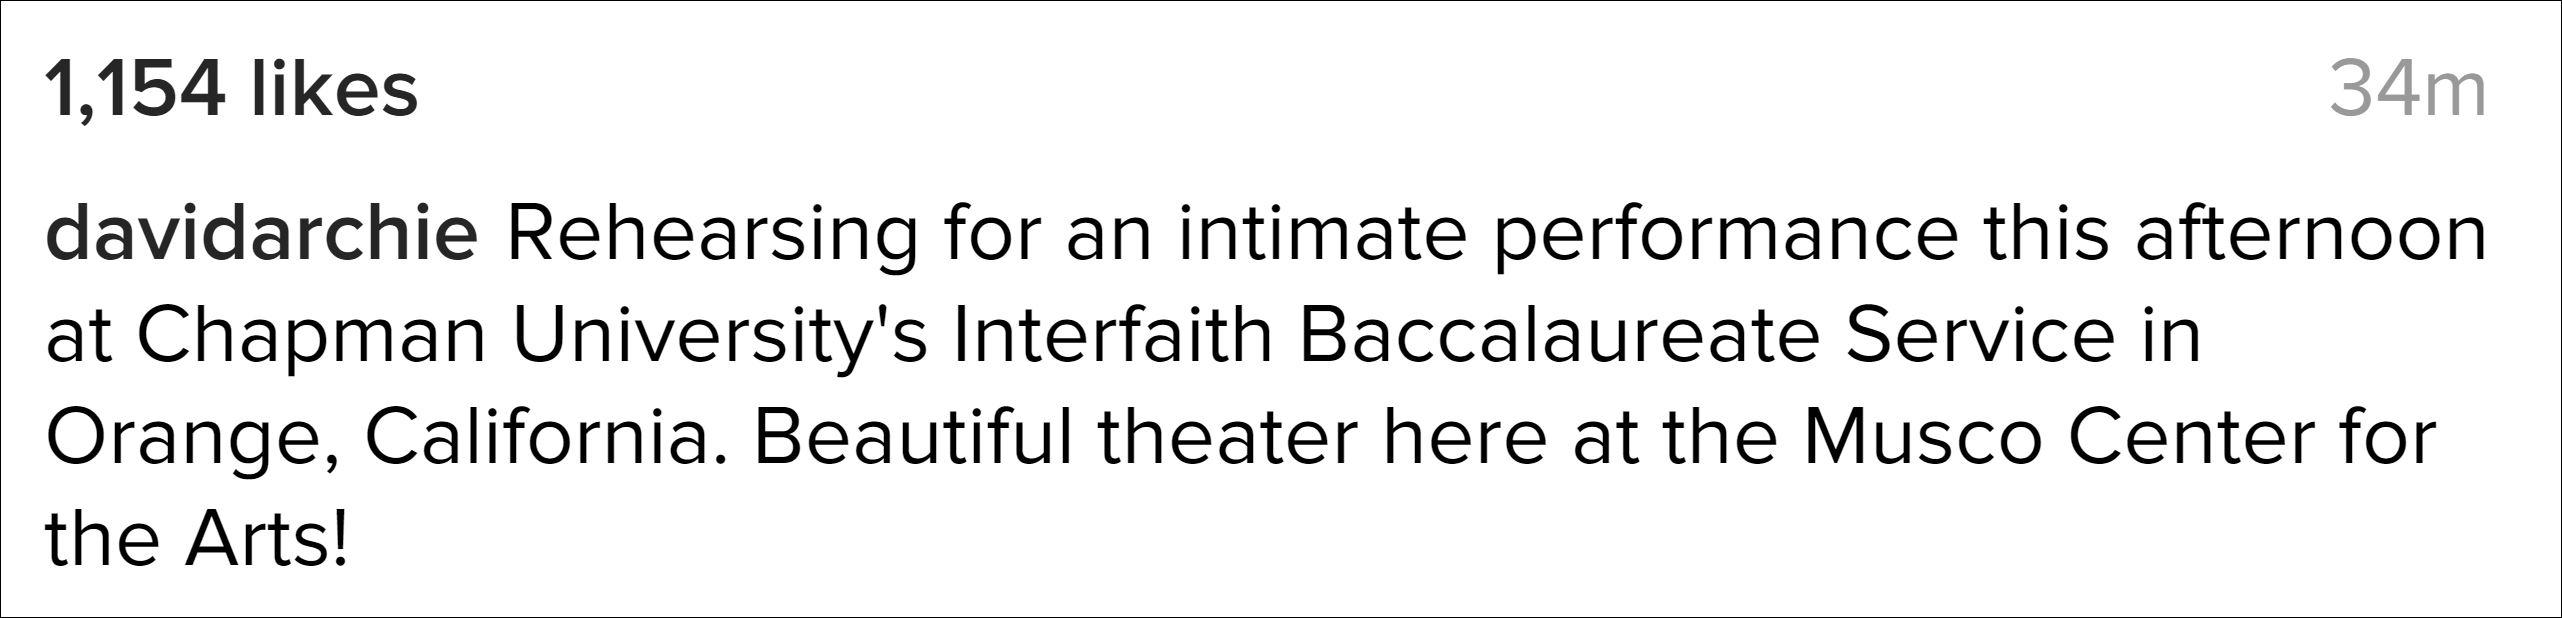 calm before the crowd musco center interfaith service baccalaureate chapman university